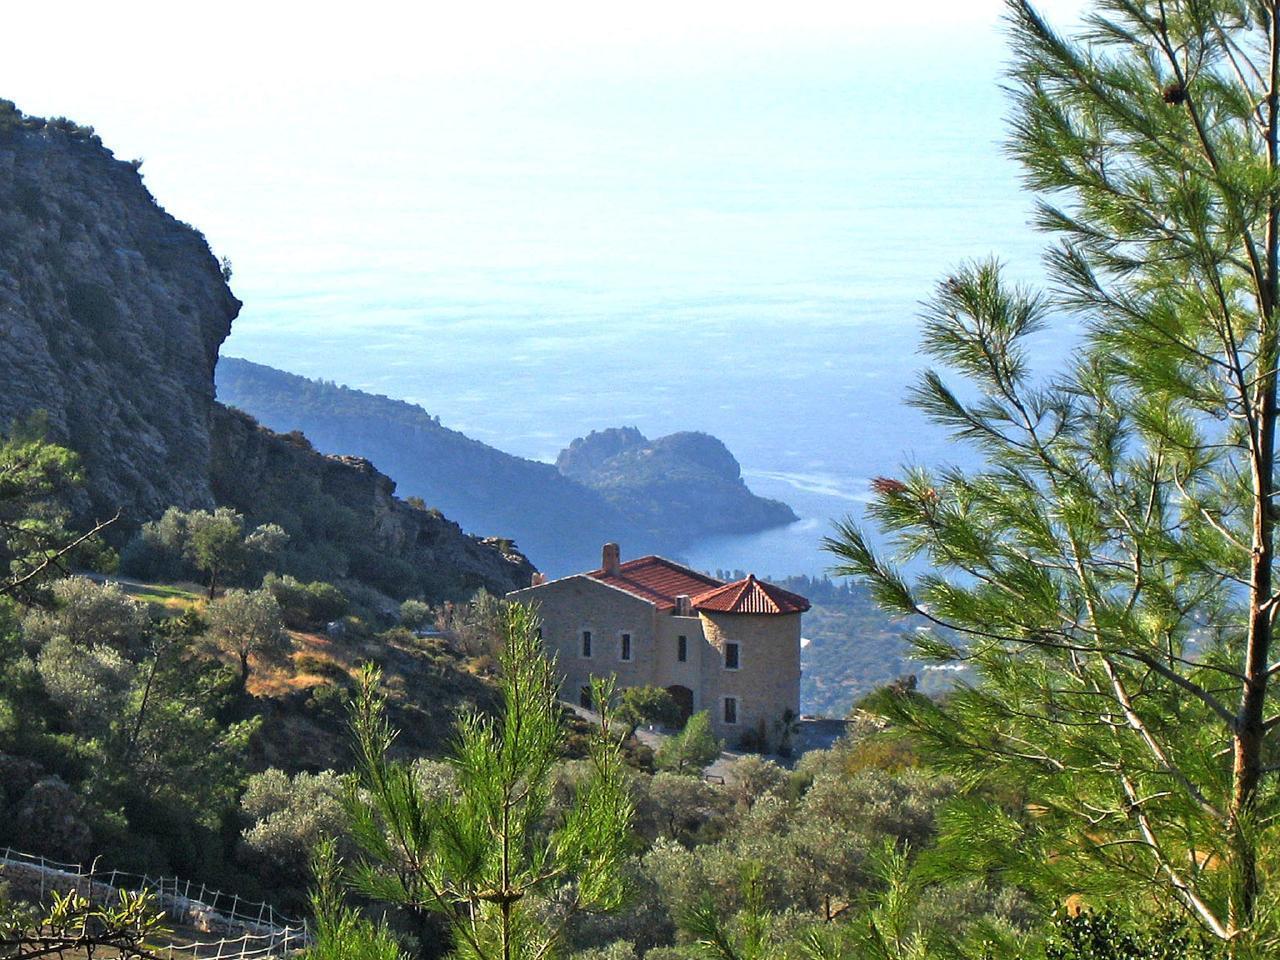 Maison de vacances Exklusives Chalet, romantisch am Berghang und Meer gelegen (2506674), Mesudiye, , Région Egéenne, Turquie, image 23